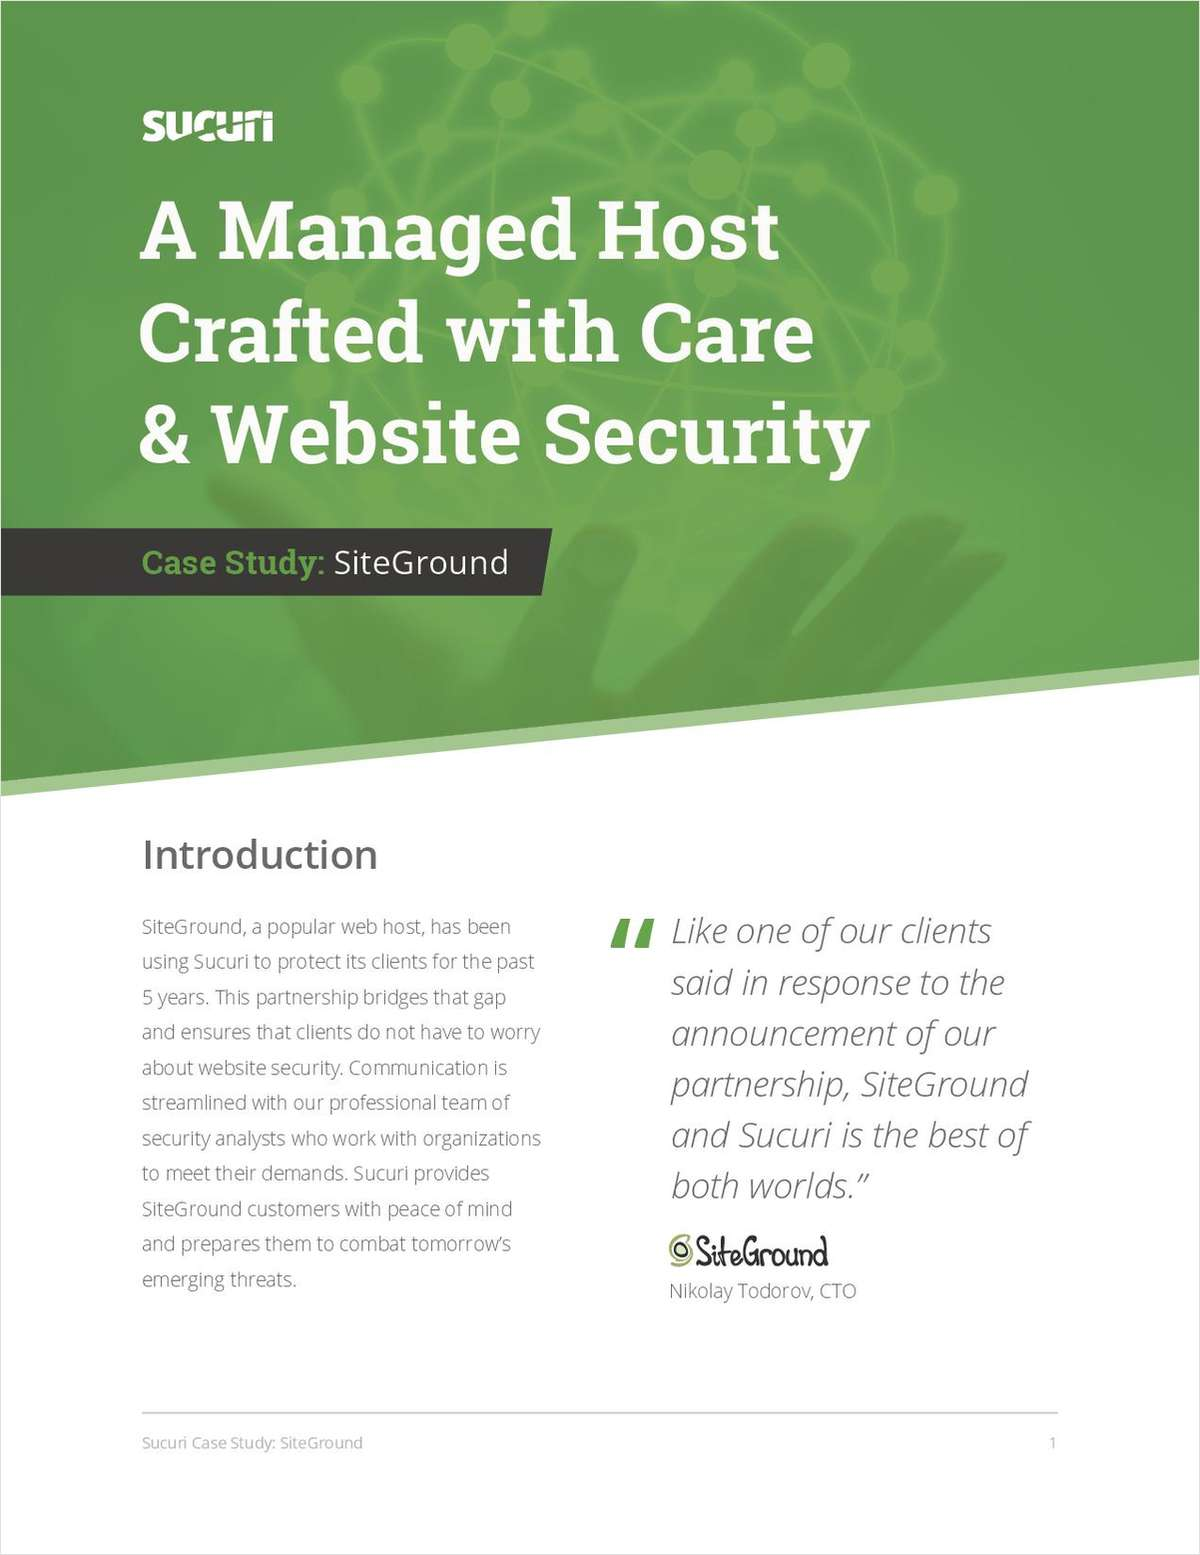 SiteGround: Website Security Case Study